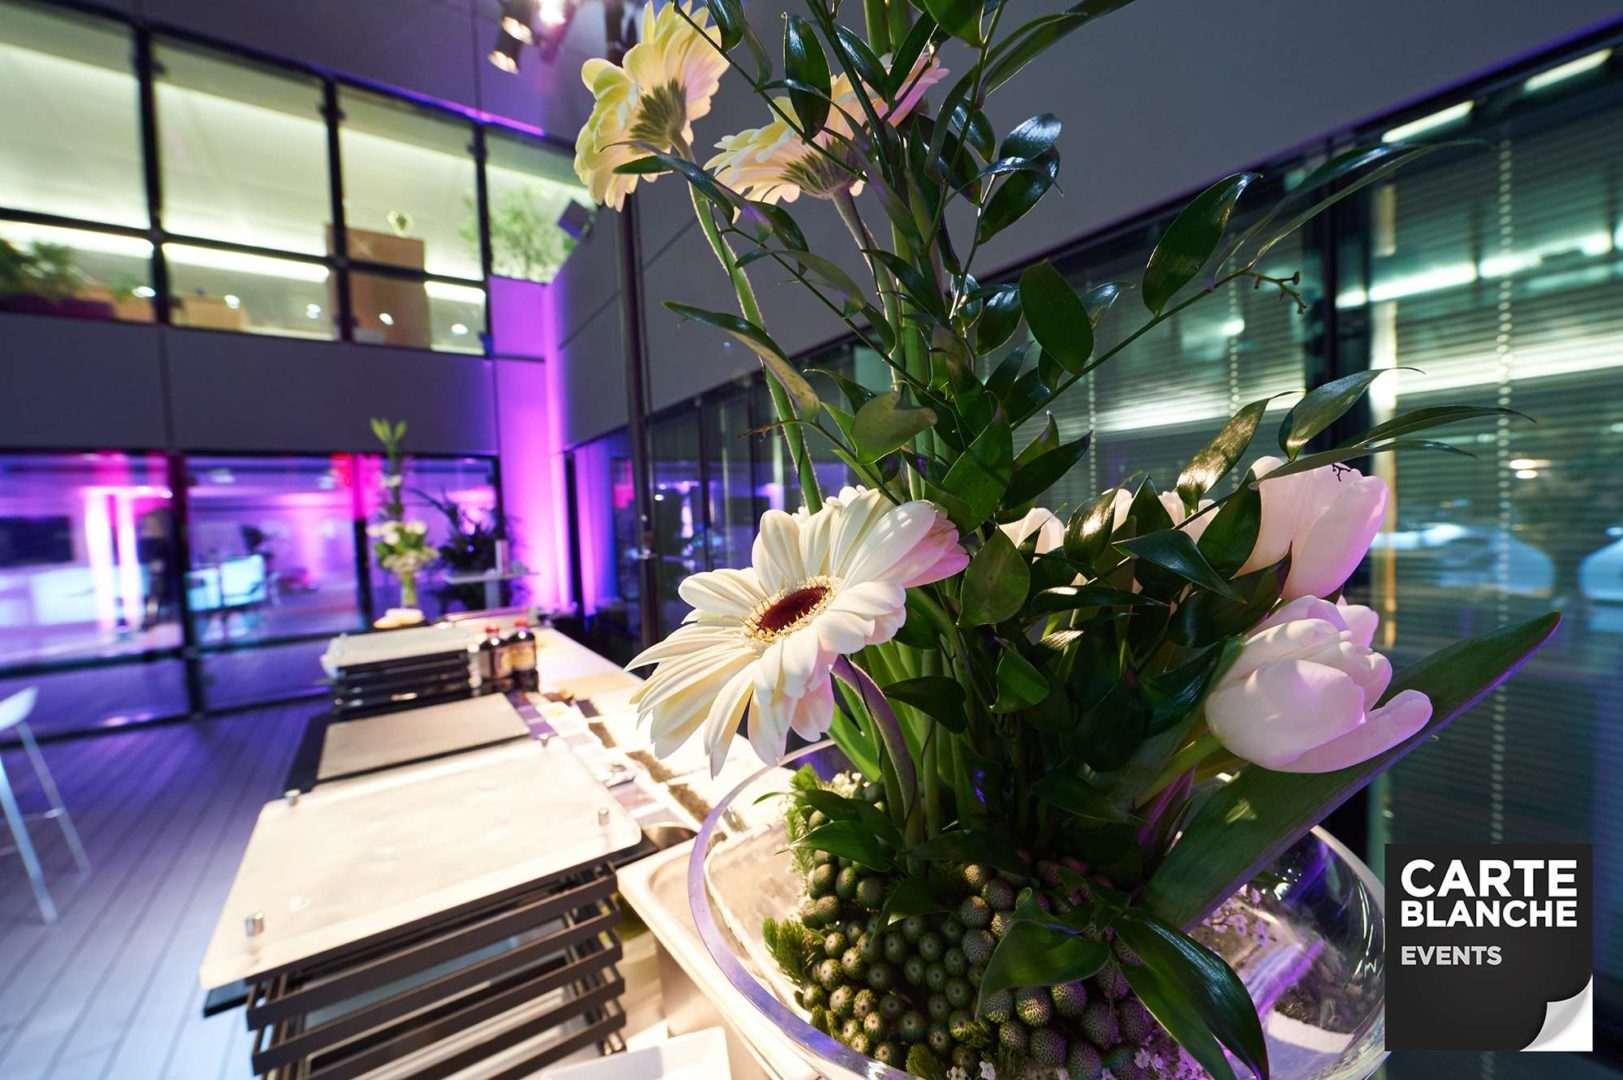 xmas-degroof-petercam-2015-056-luxembourg-event